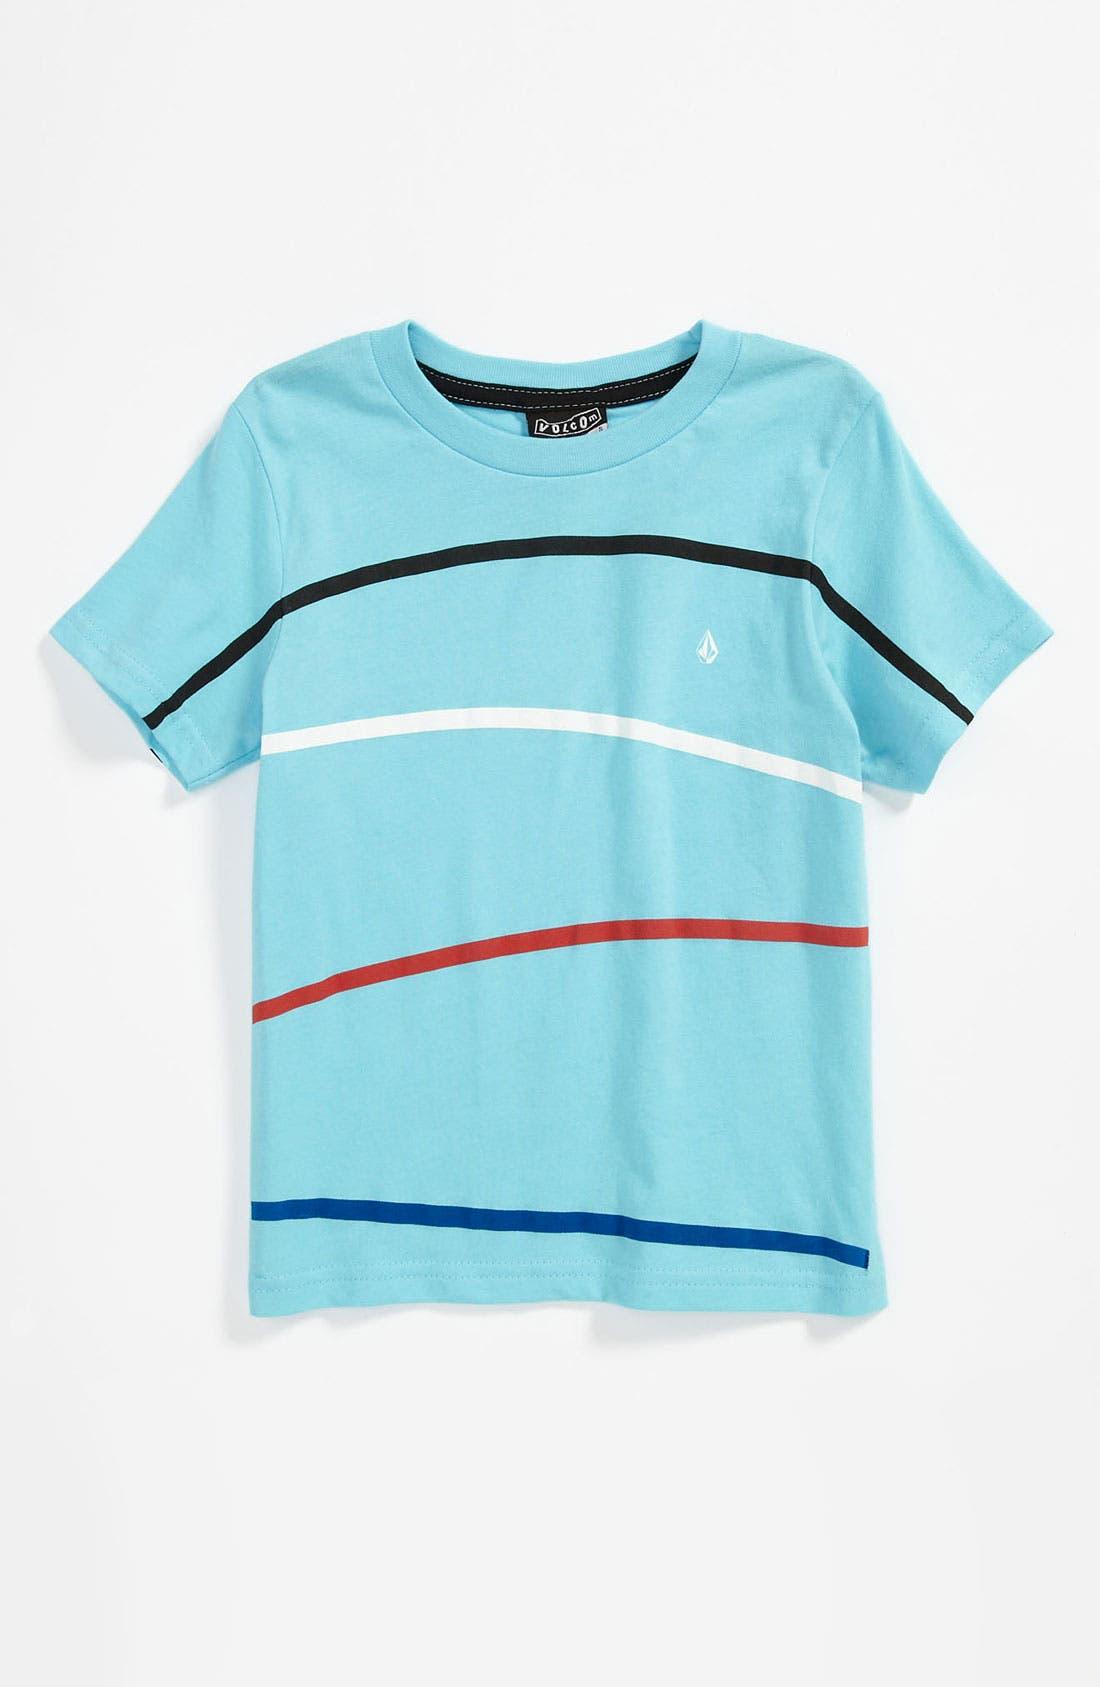 Main Image - Volcom 'Think' Stripe T-Shirt (Little Boys)